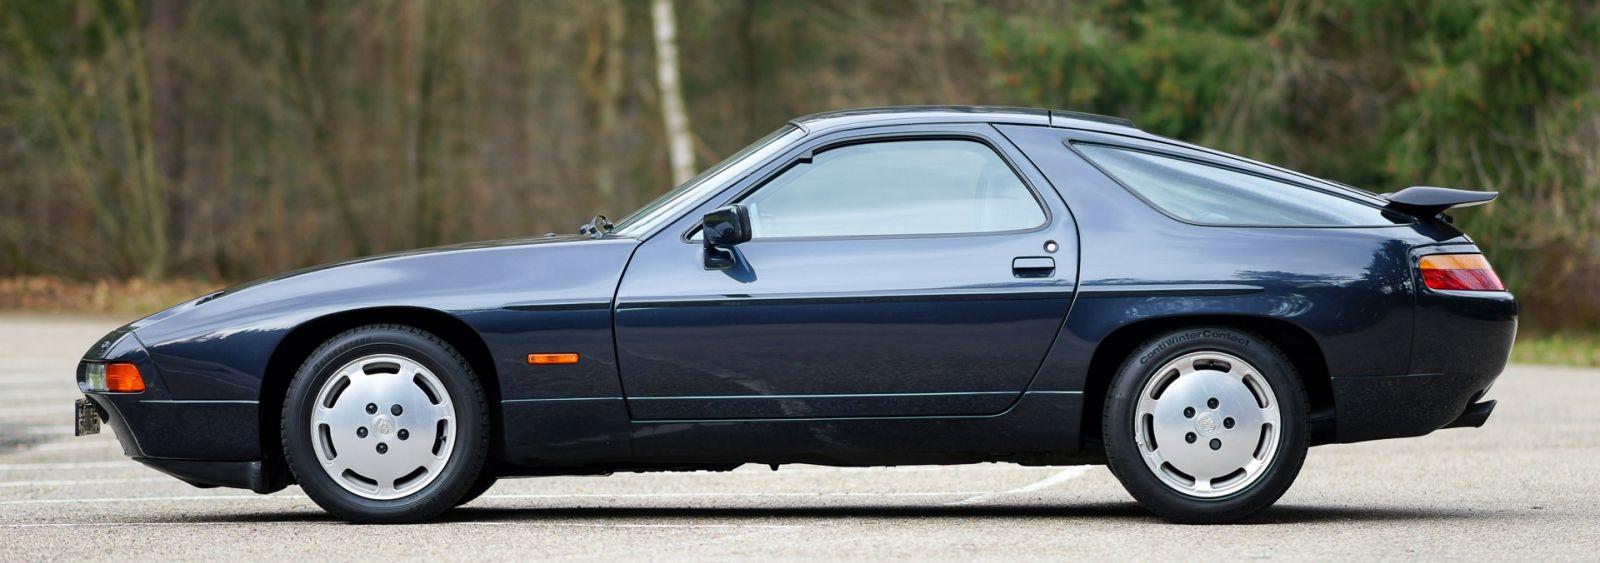 Porsche 928 s4 1987 classicargarage fr for Interieur 928